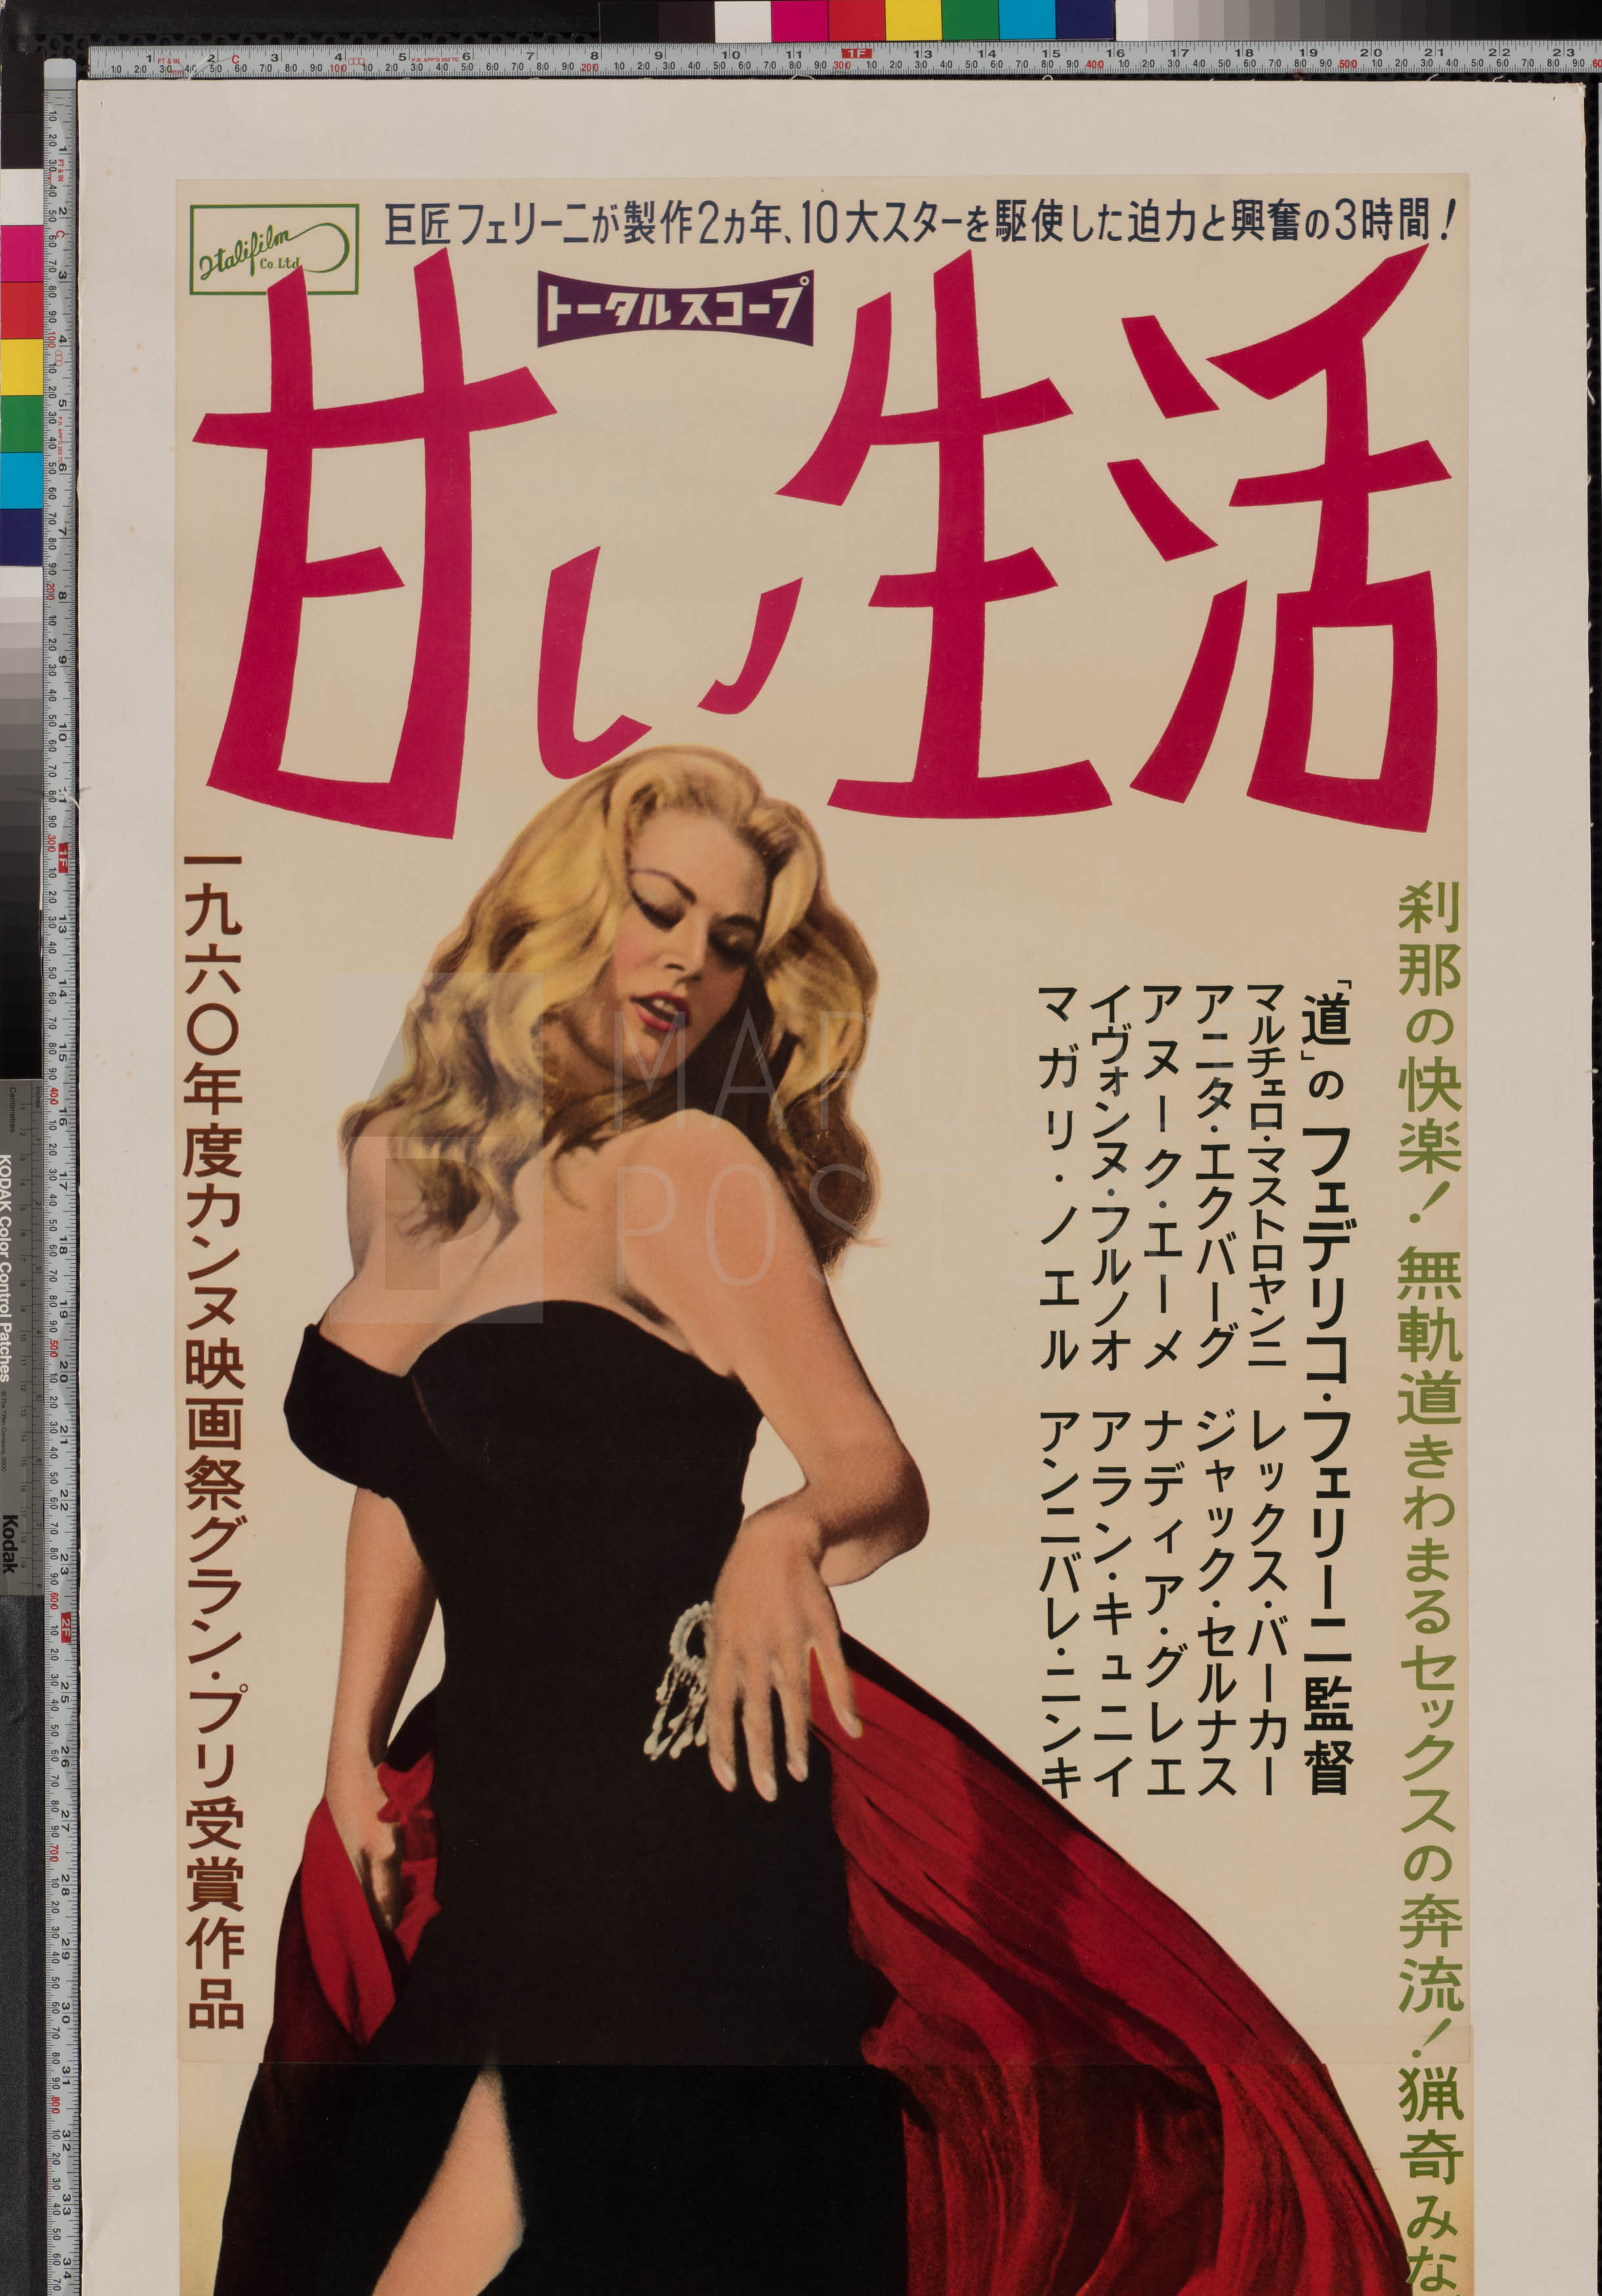 38-la-dolce-vita-japanese-stb-1960-02